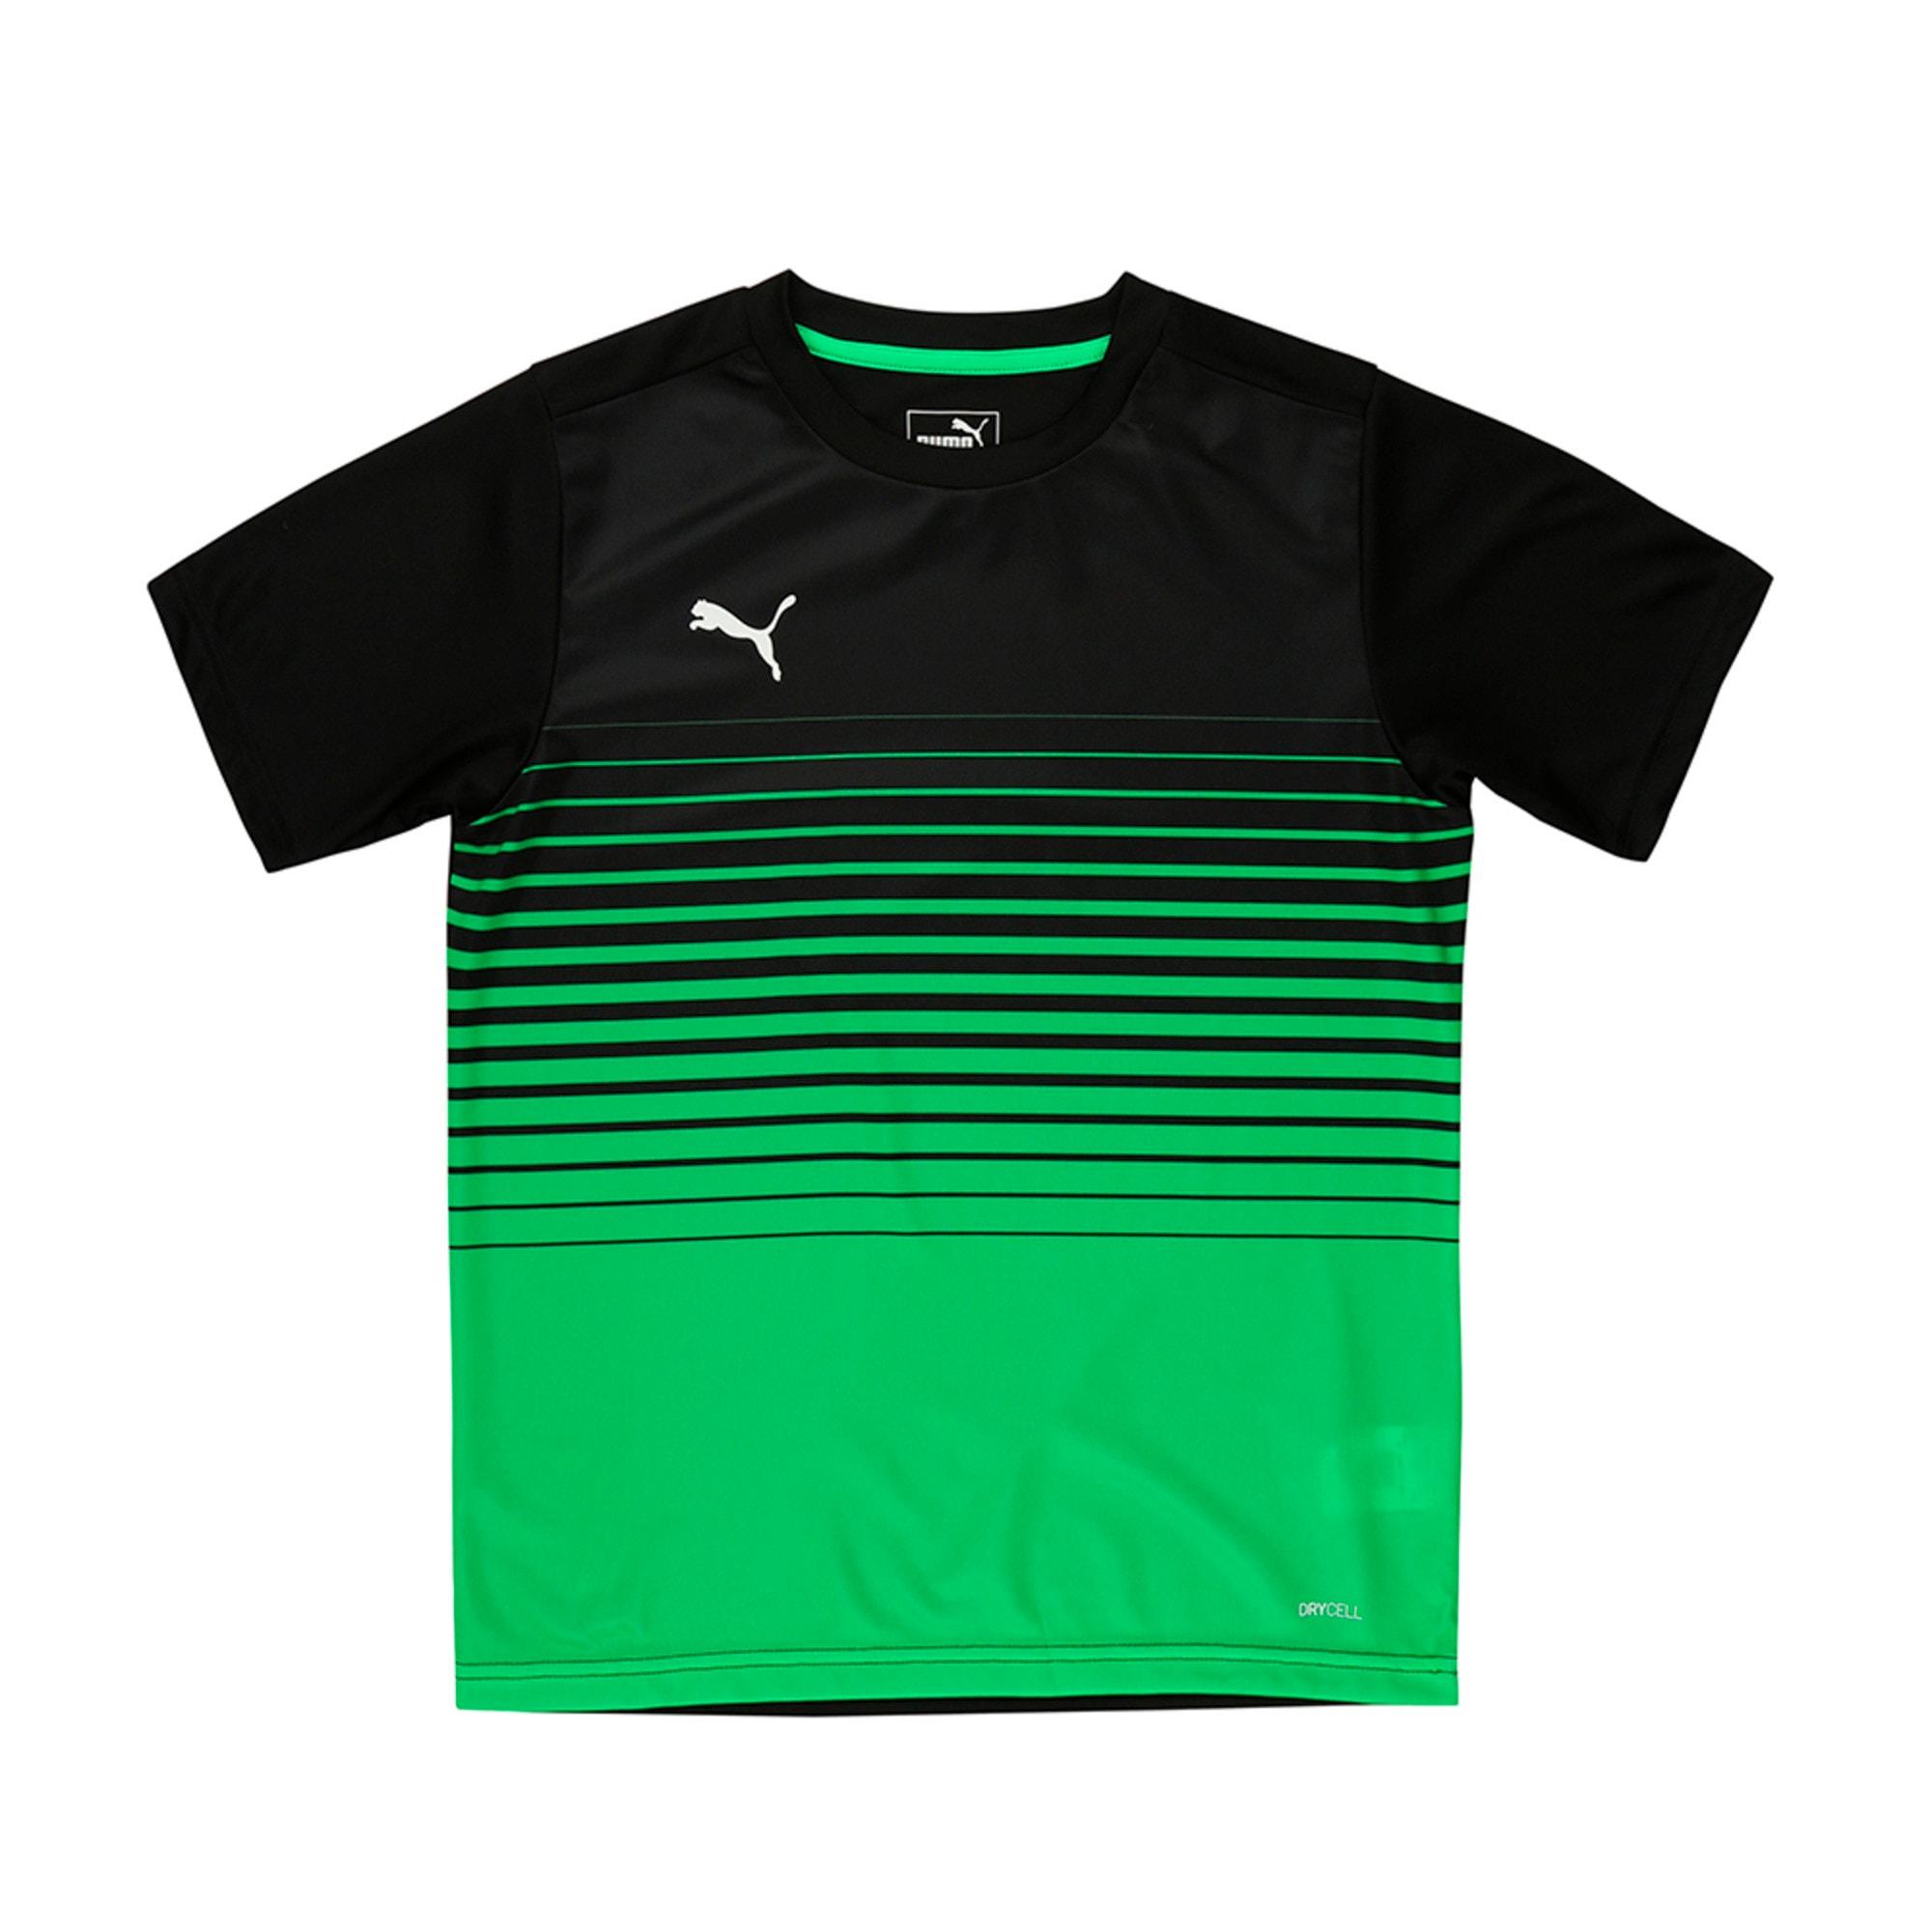 Thumbnail 1 of ftblPLAY Graphic Boys' Shirt, Puma Black-ANDEAN TOUCAN, medium-IND